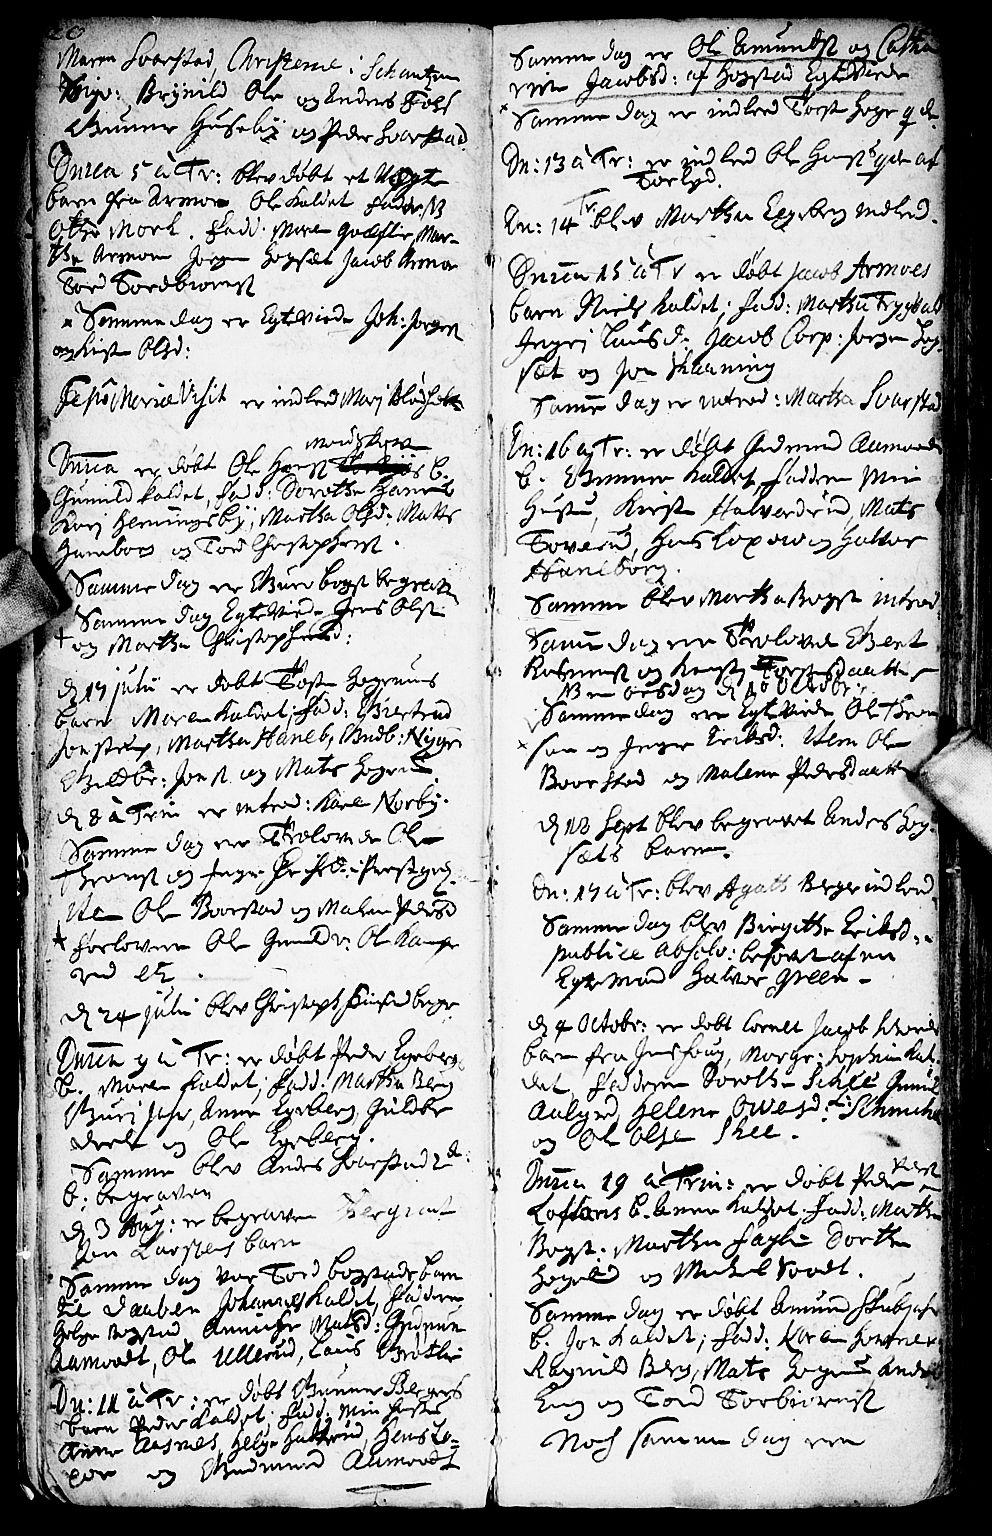 SAO, Aurskog prestekontor Kirkebøker, F/Fa/L0001: Ministerialbok nr. I 1, 1707-1735, s. 20-21